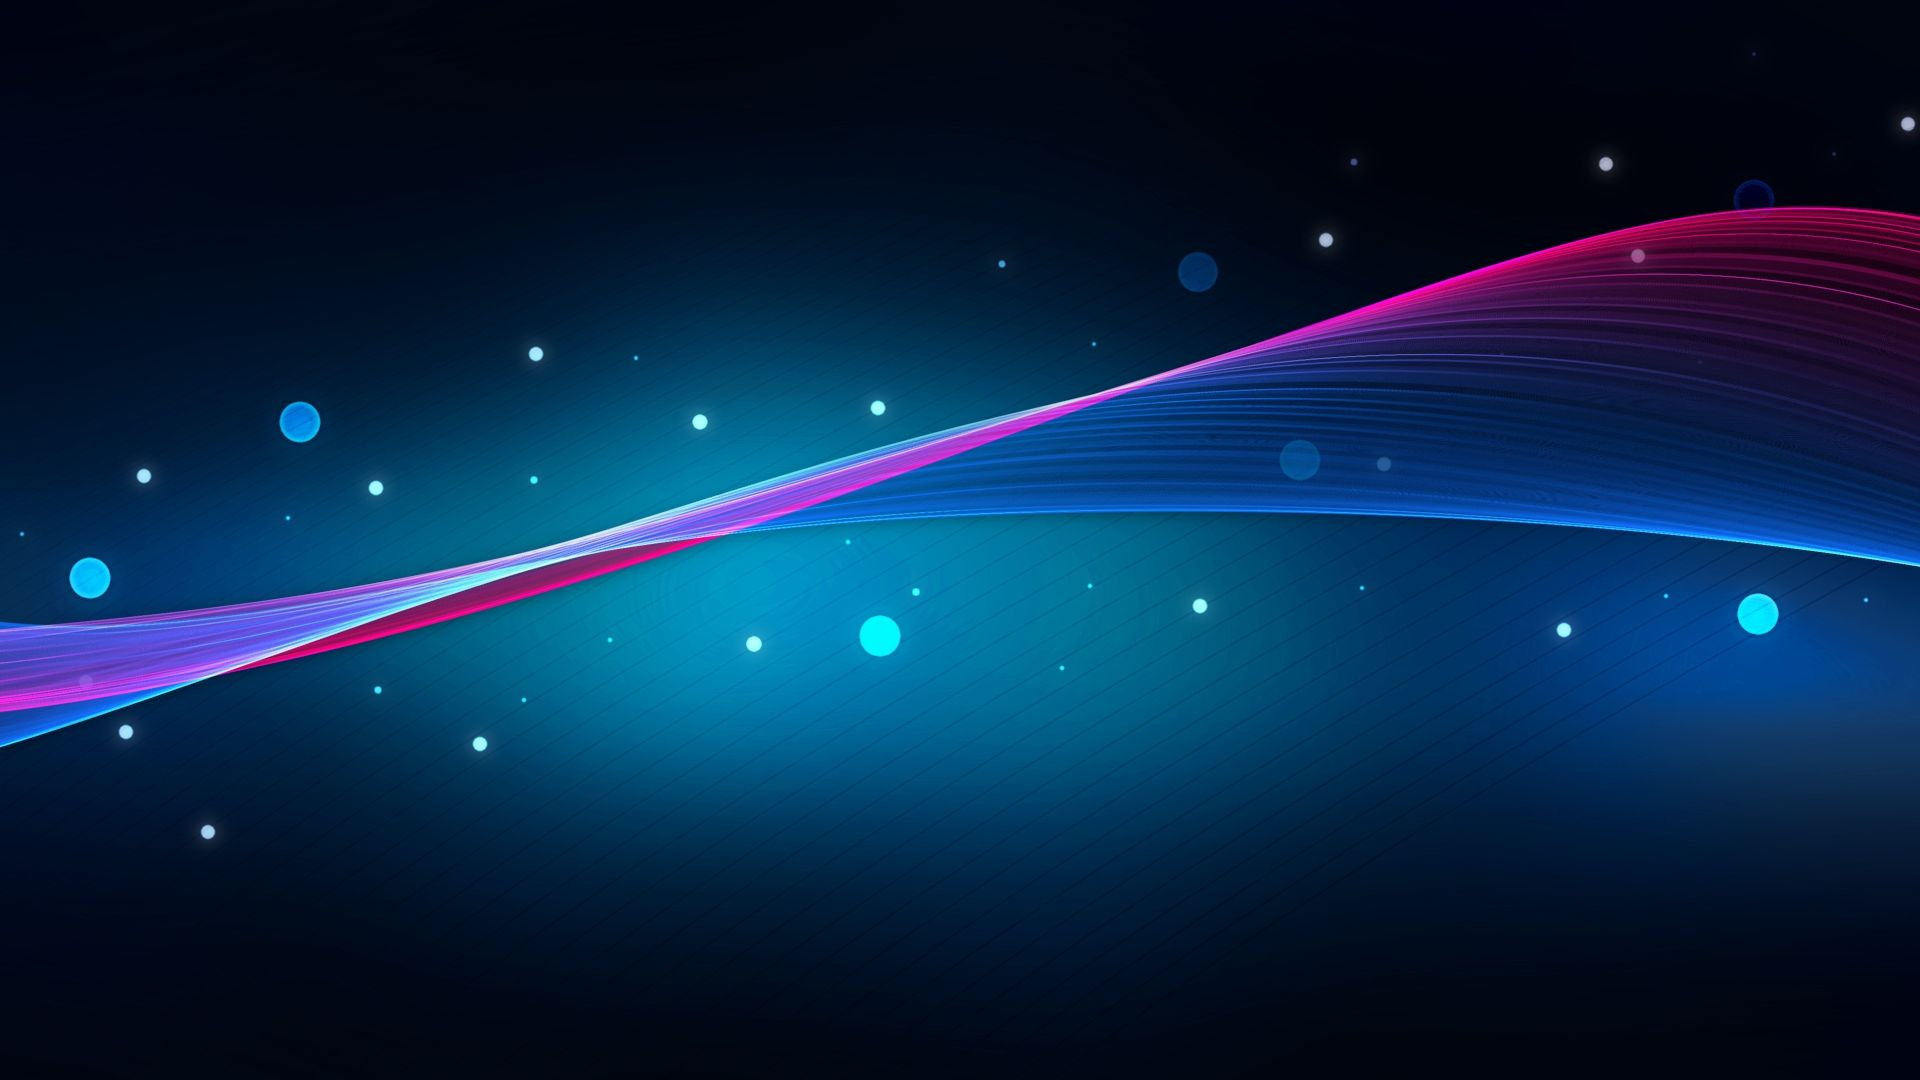 1429006955 Linux Desktop Wallpapers Hd Solid Wallpaper Blue